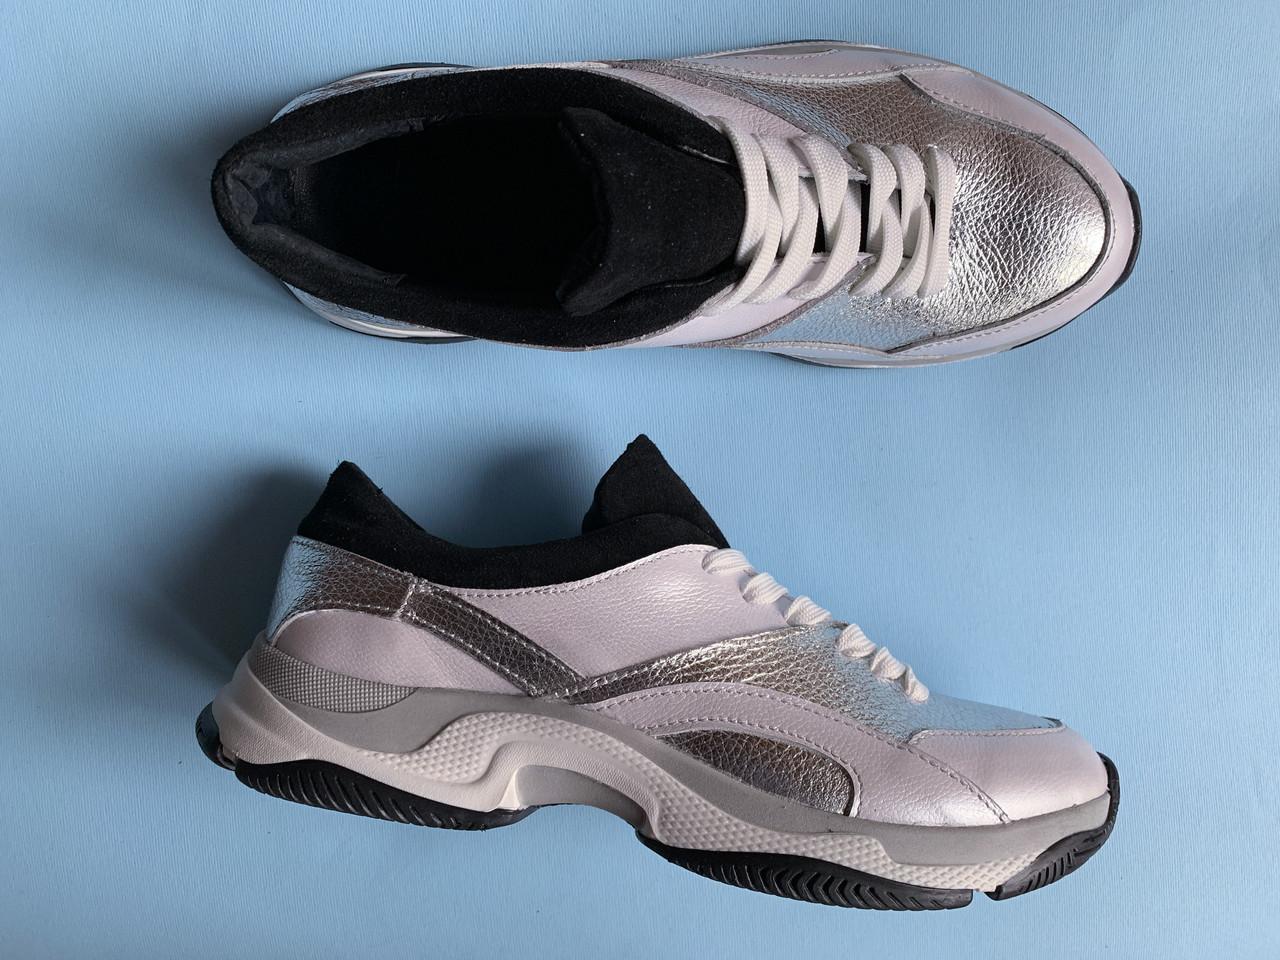 Кроссовки 508-16 белый перл + союзка серебро флот + черн замш (крос 3 черн след)